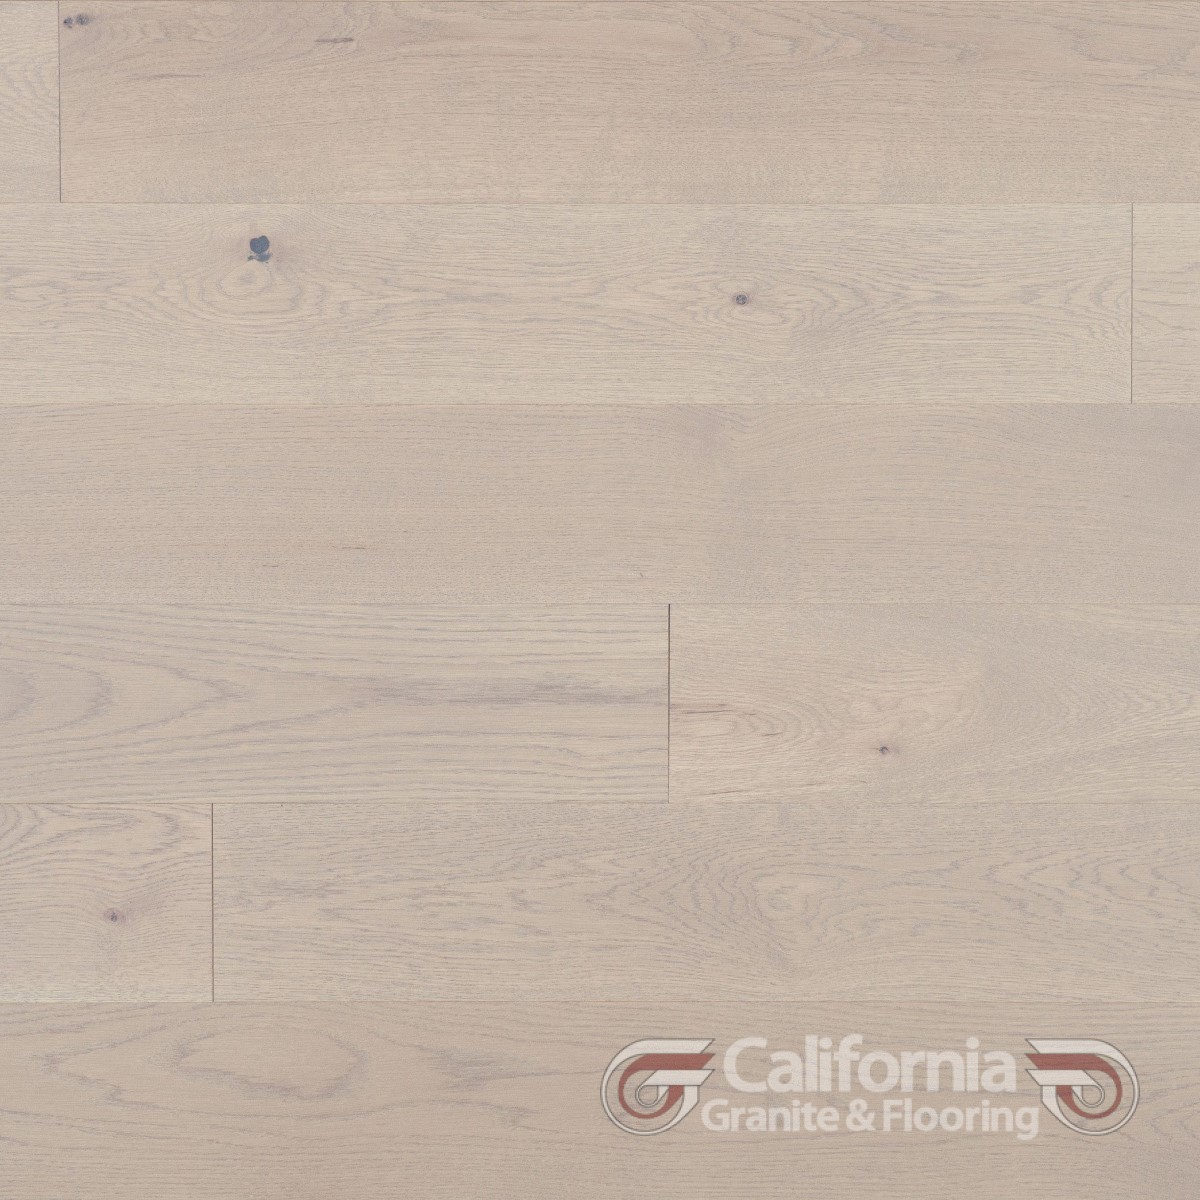 hardwood-flooring-white-oak-snowdrift-character-brushed-herringbone-2